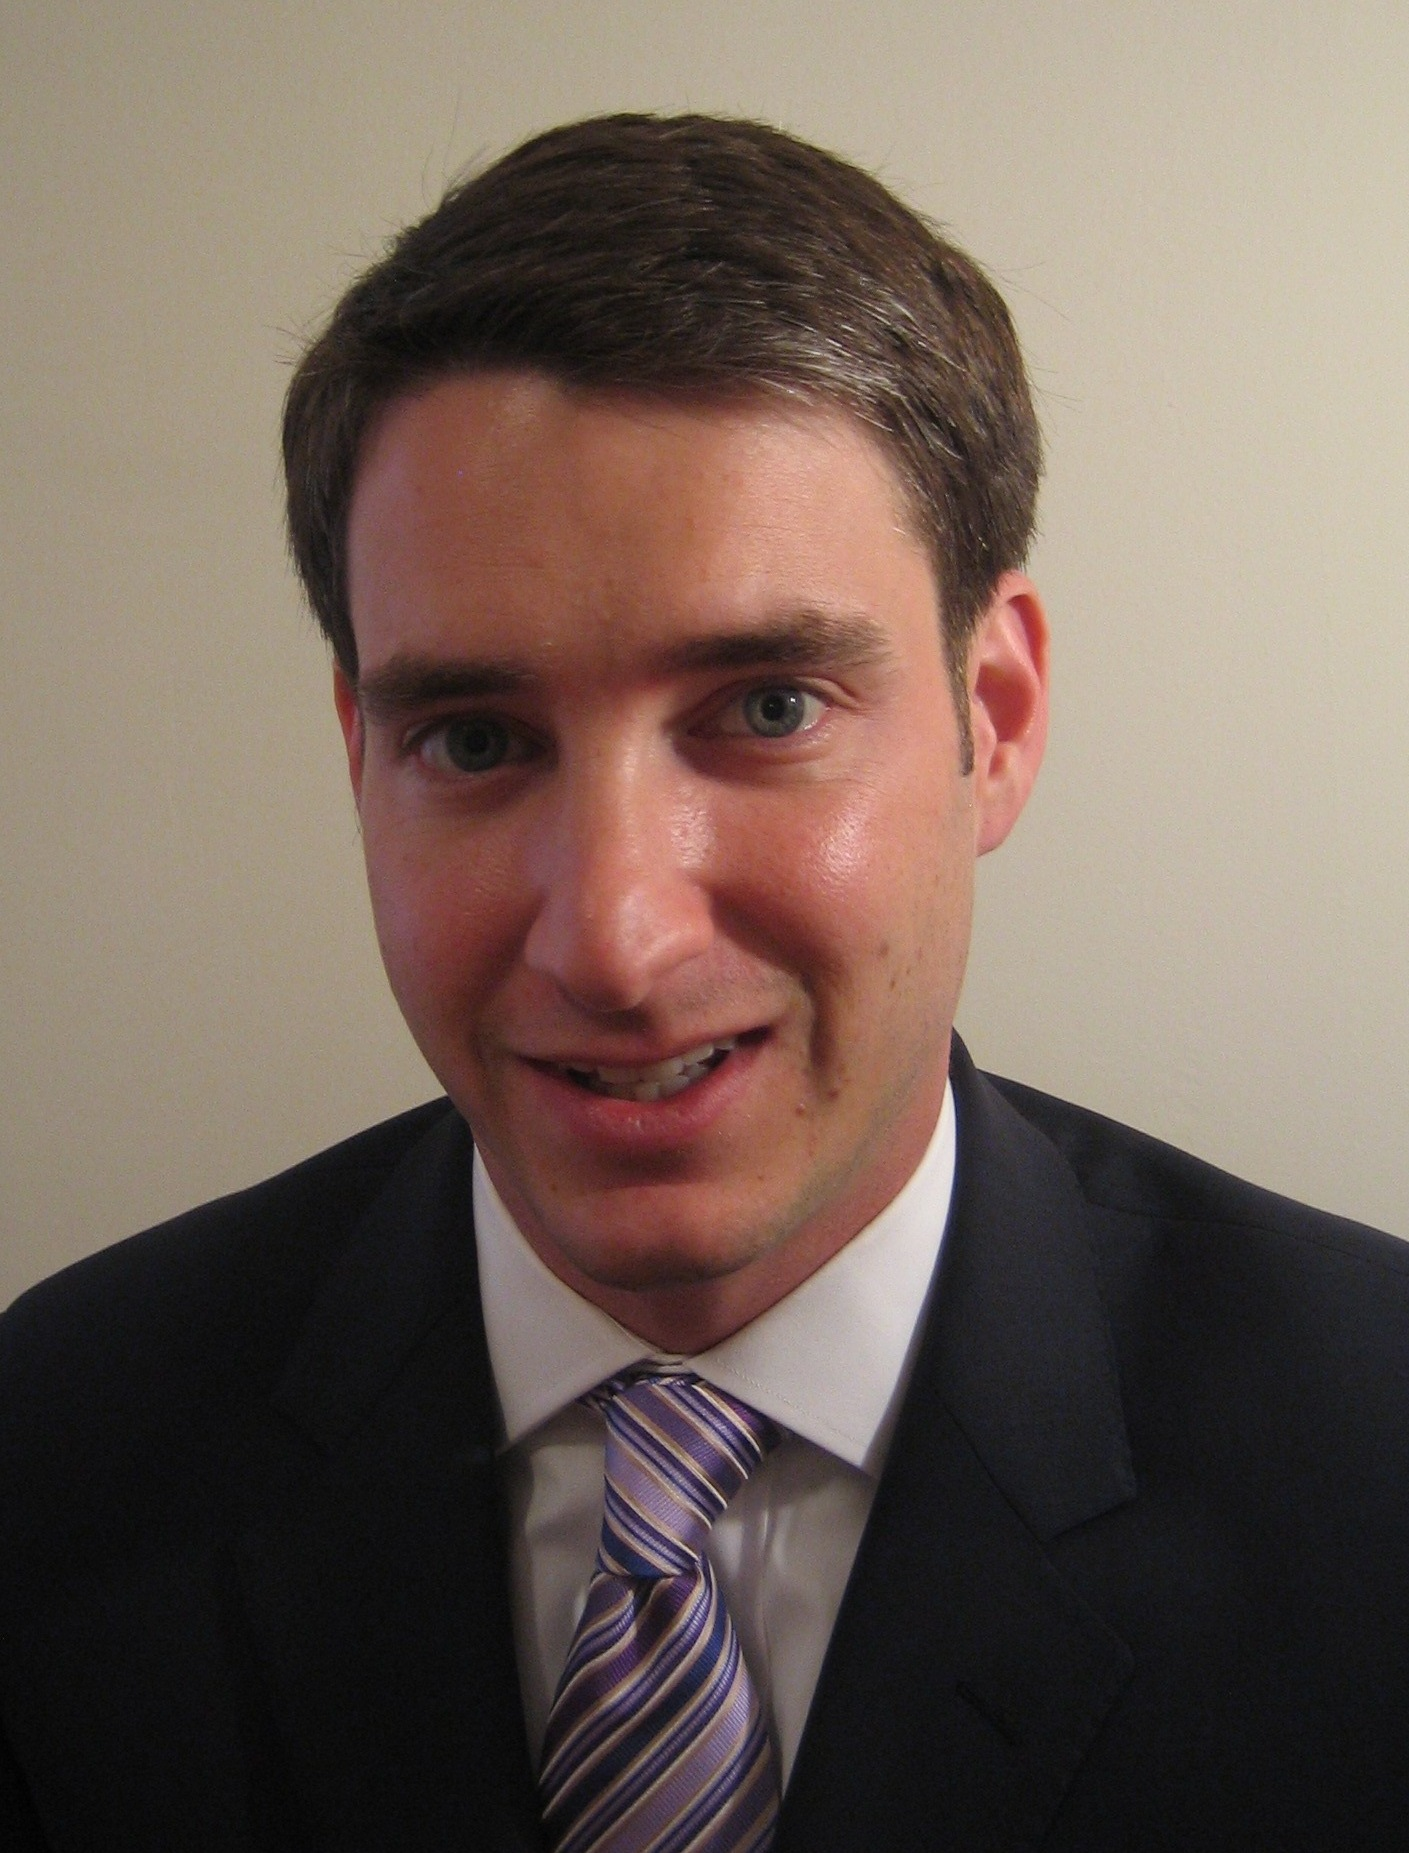 Bryan K. Mignone, 2007-2008 AGI Fisher Fellow